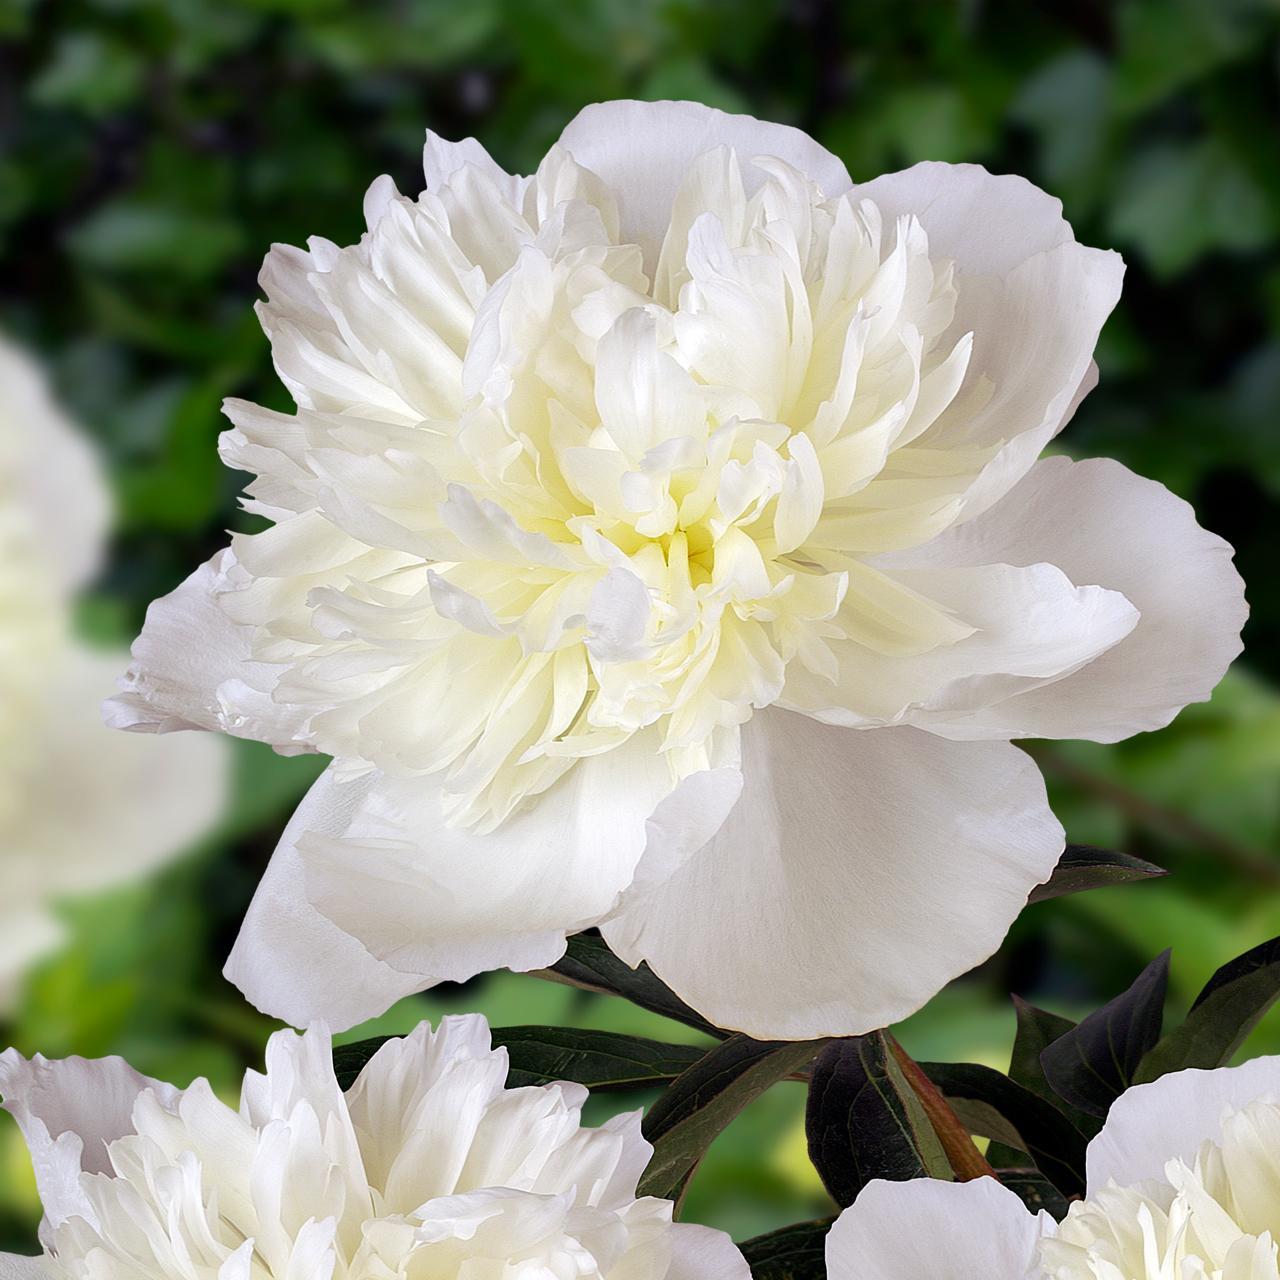 Paeonia lactiflora 'Duchesse de Nemours' plant